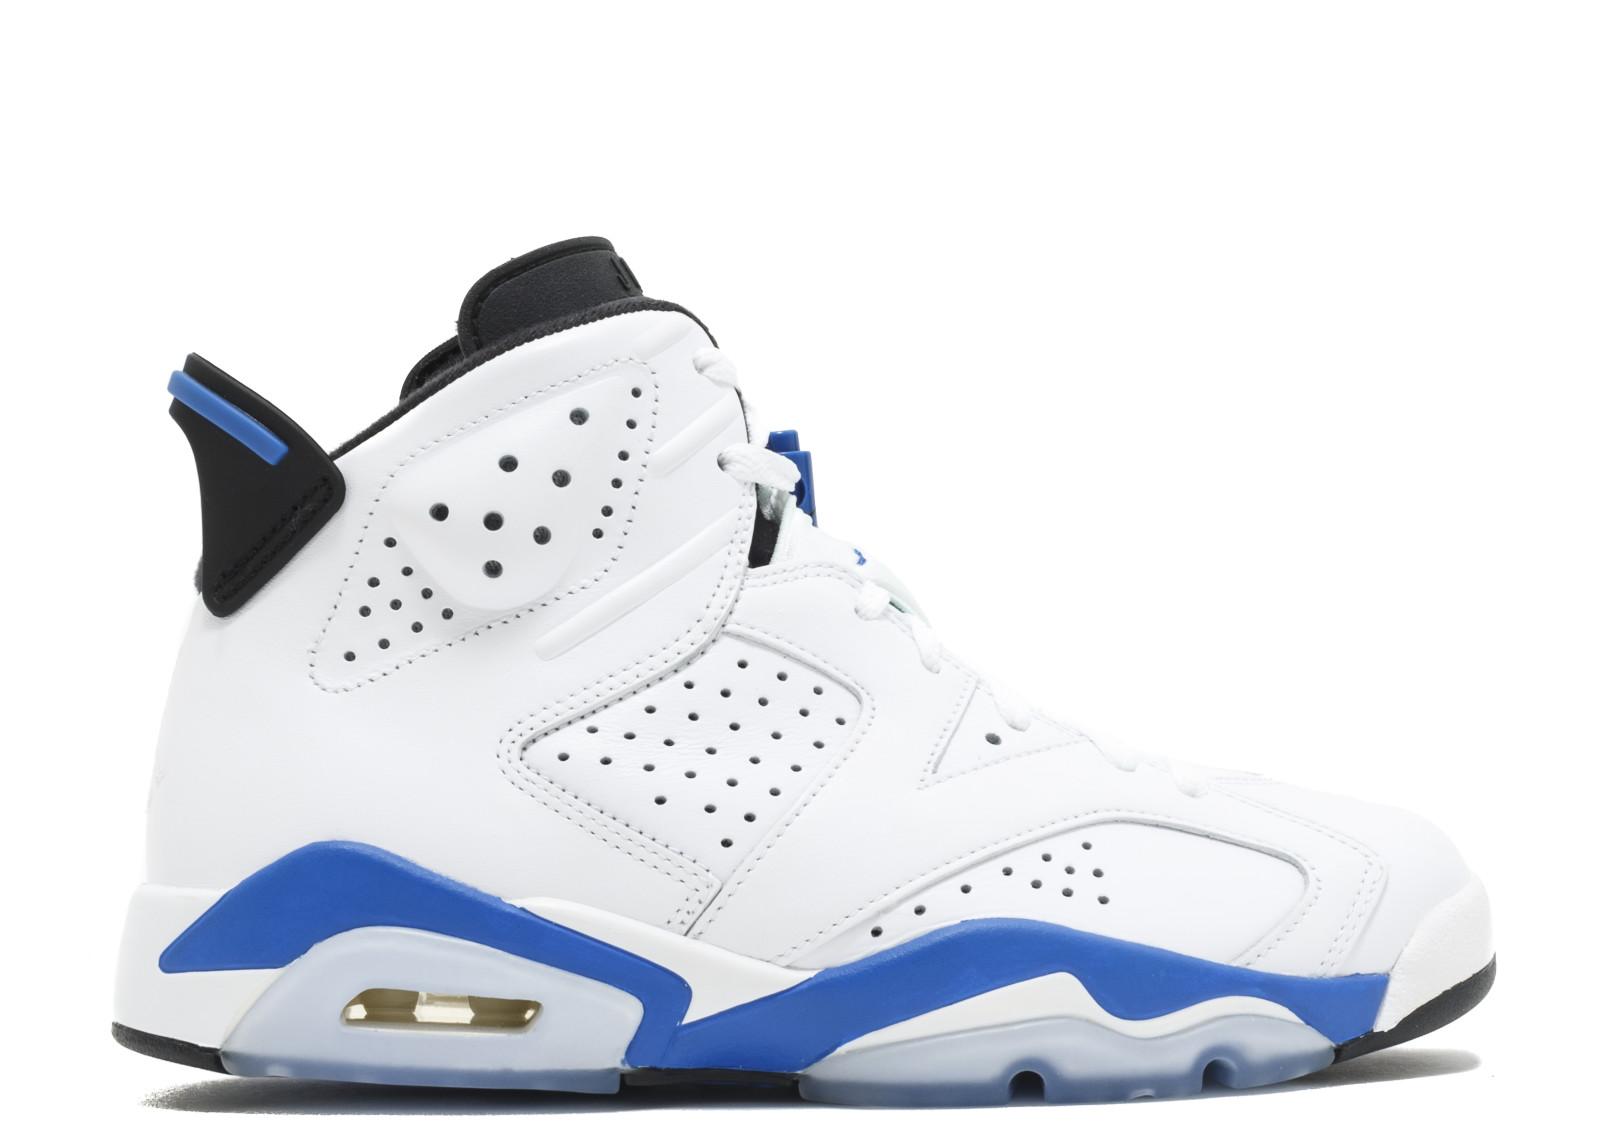 on sale 65561 940c0 Kick Avenue - Authentic Sneakers